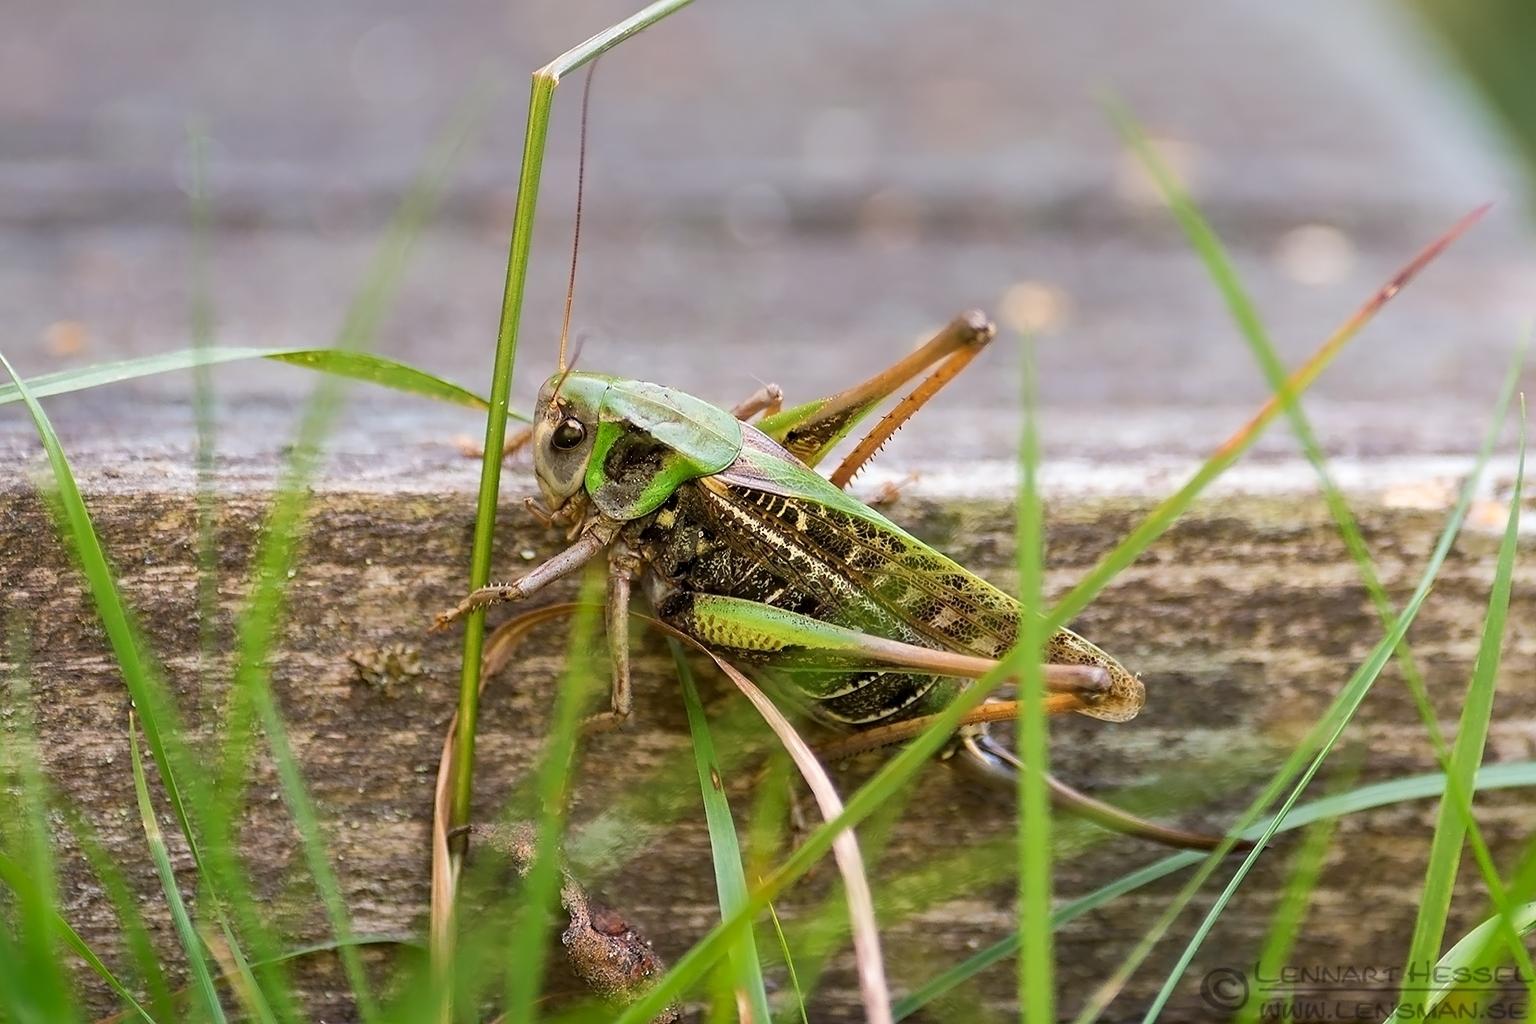 Grasshopper Öland 2012